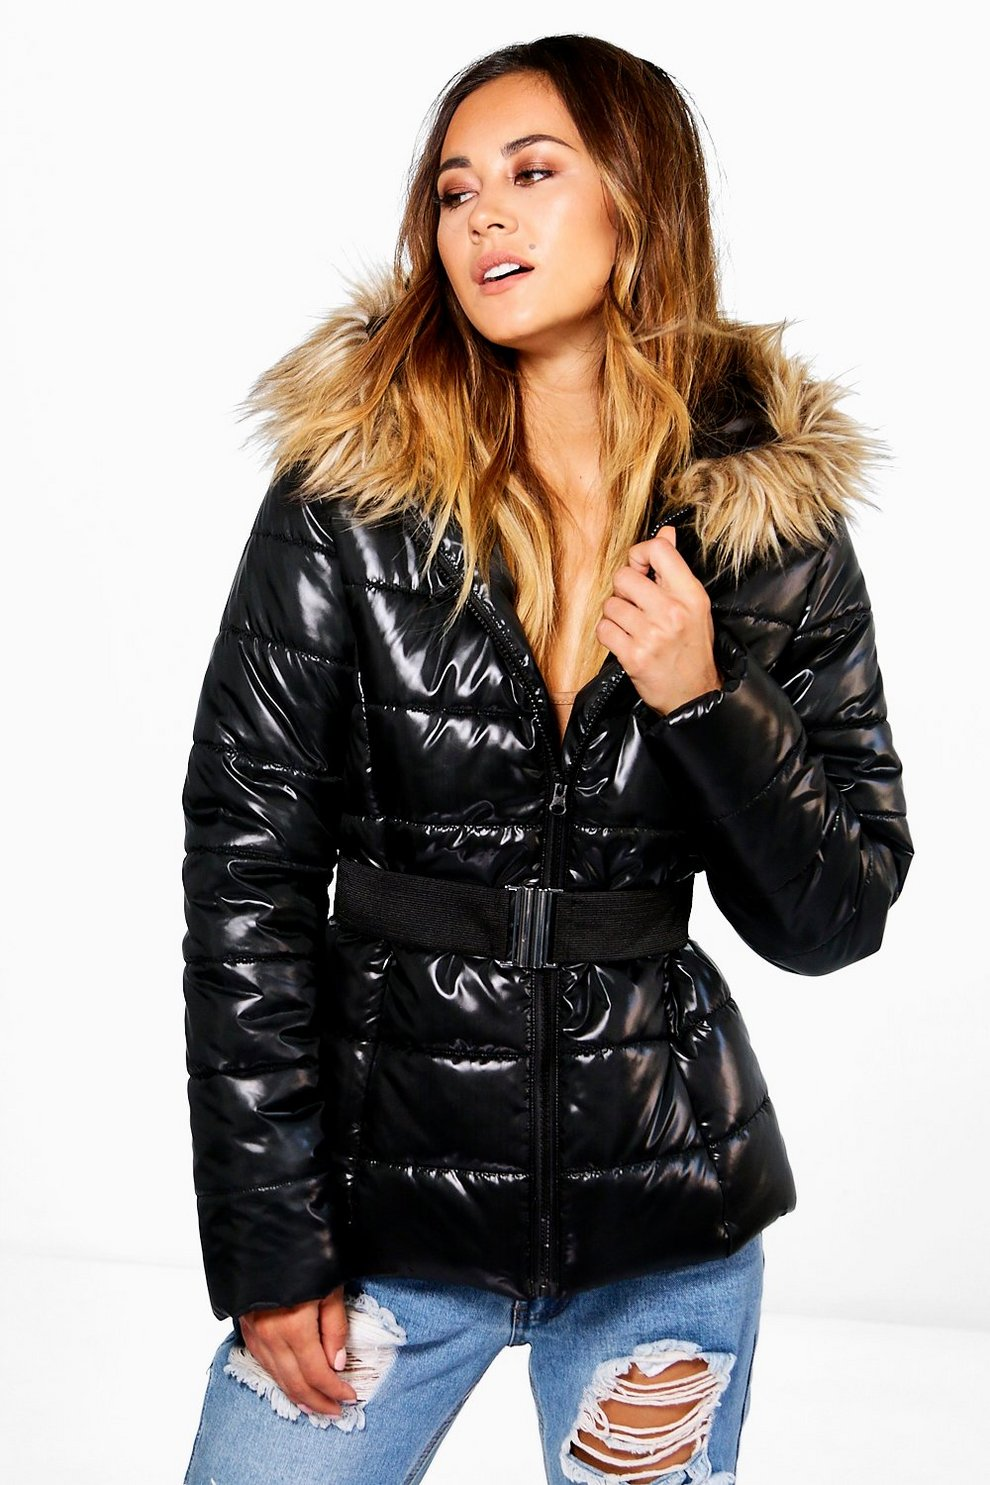 Black wet look puffa coat with fur hood